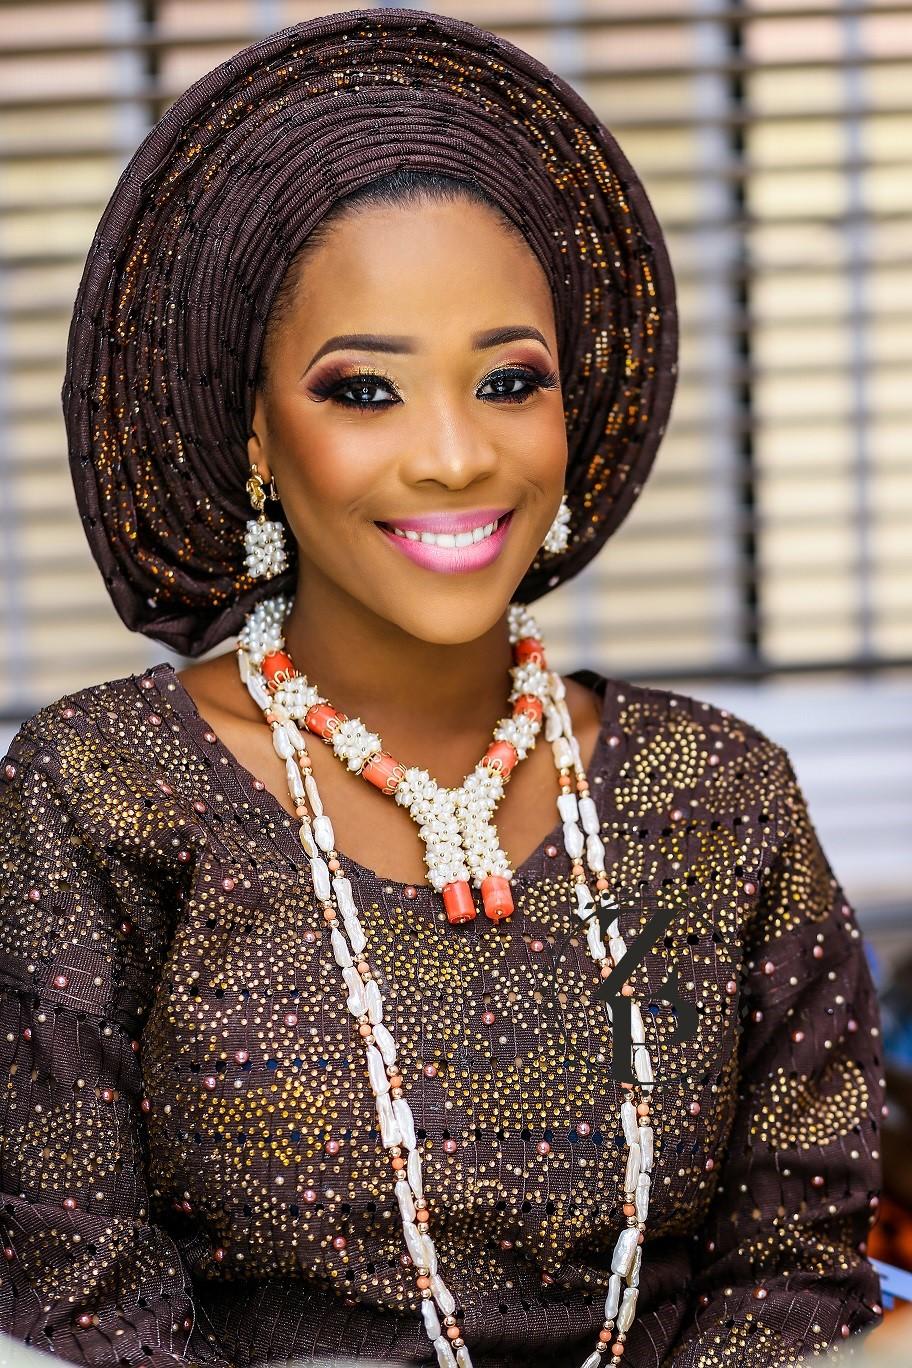 woman-yoruba-in-iro-and-buba-nigerian-traditional-outfit-pearl-and-coral-jewelry-gele.jpg